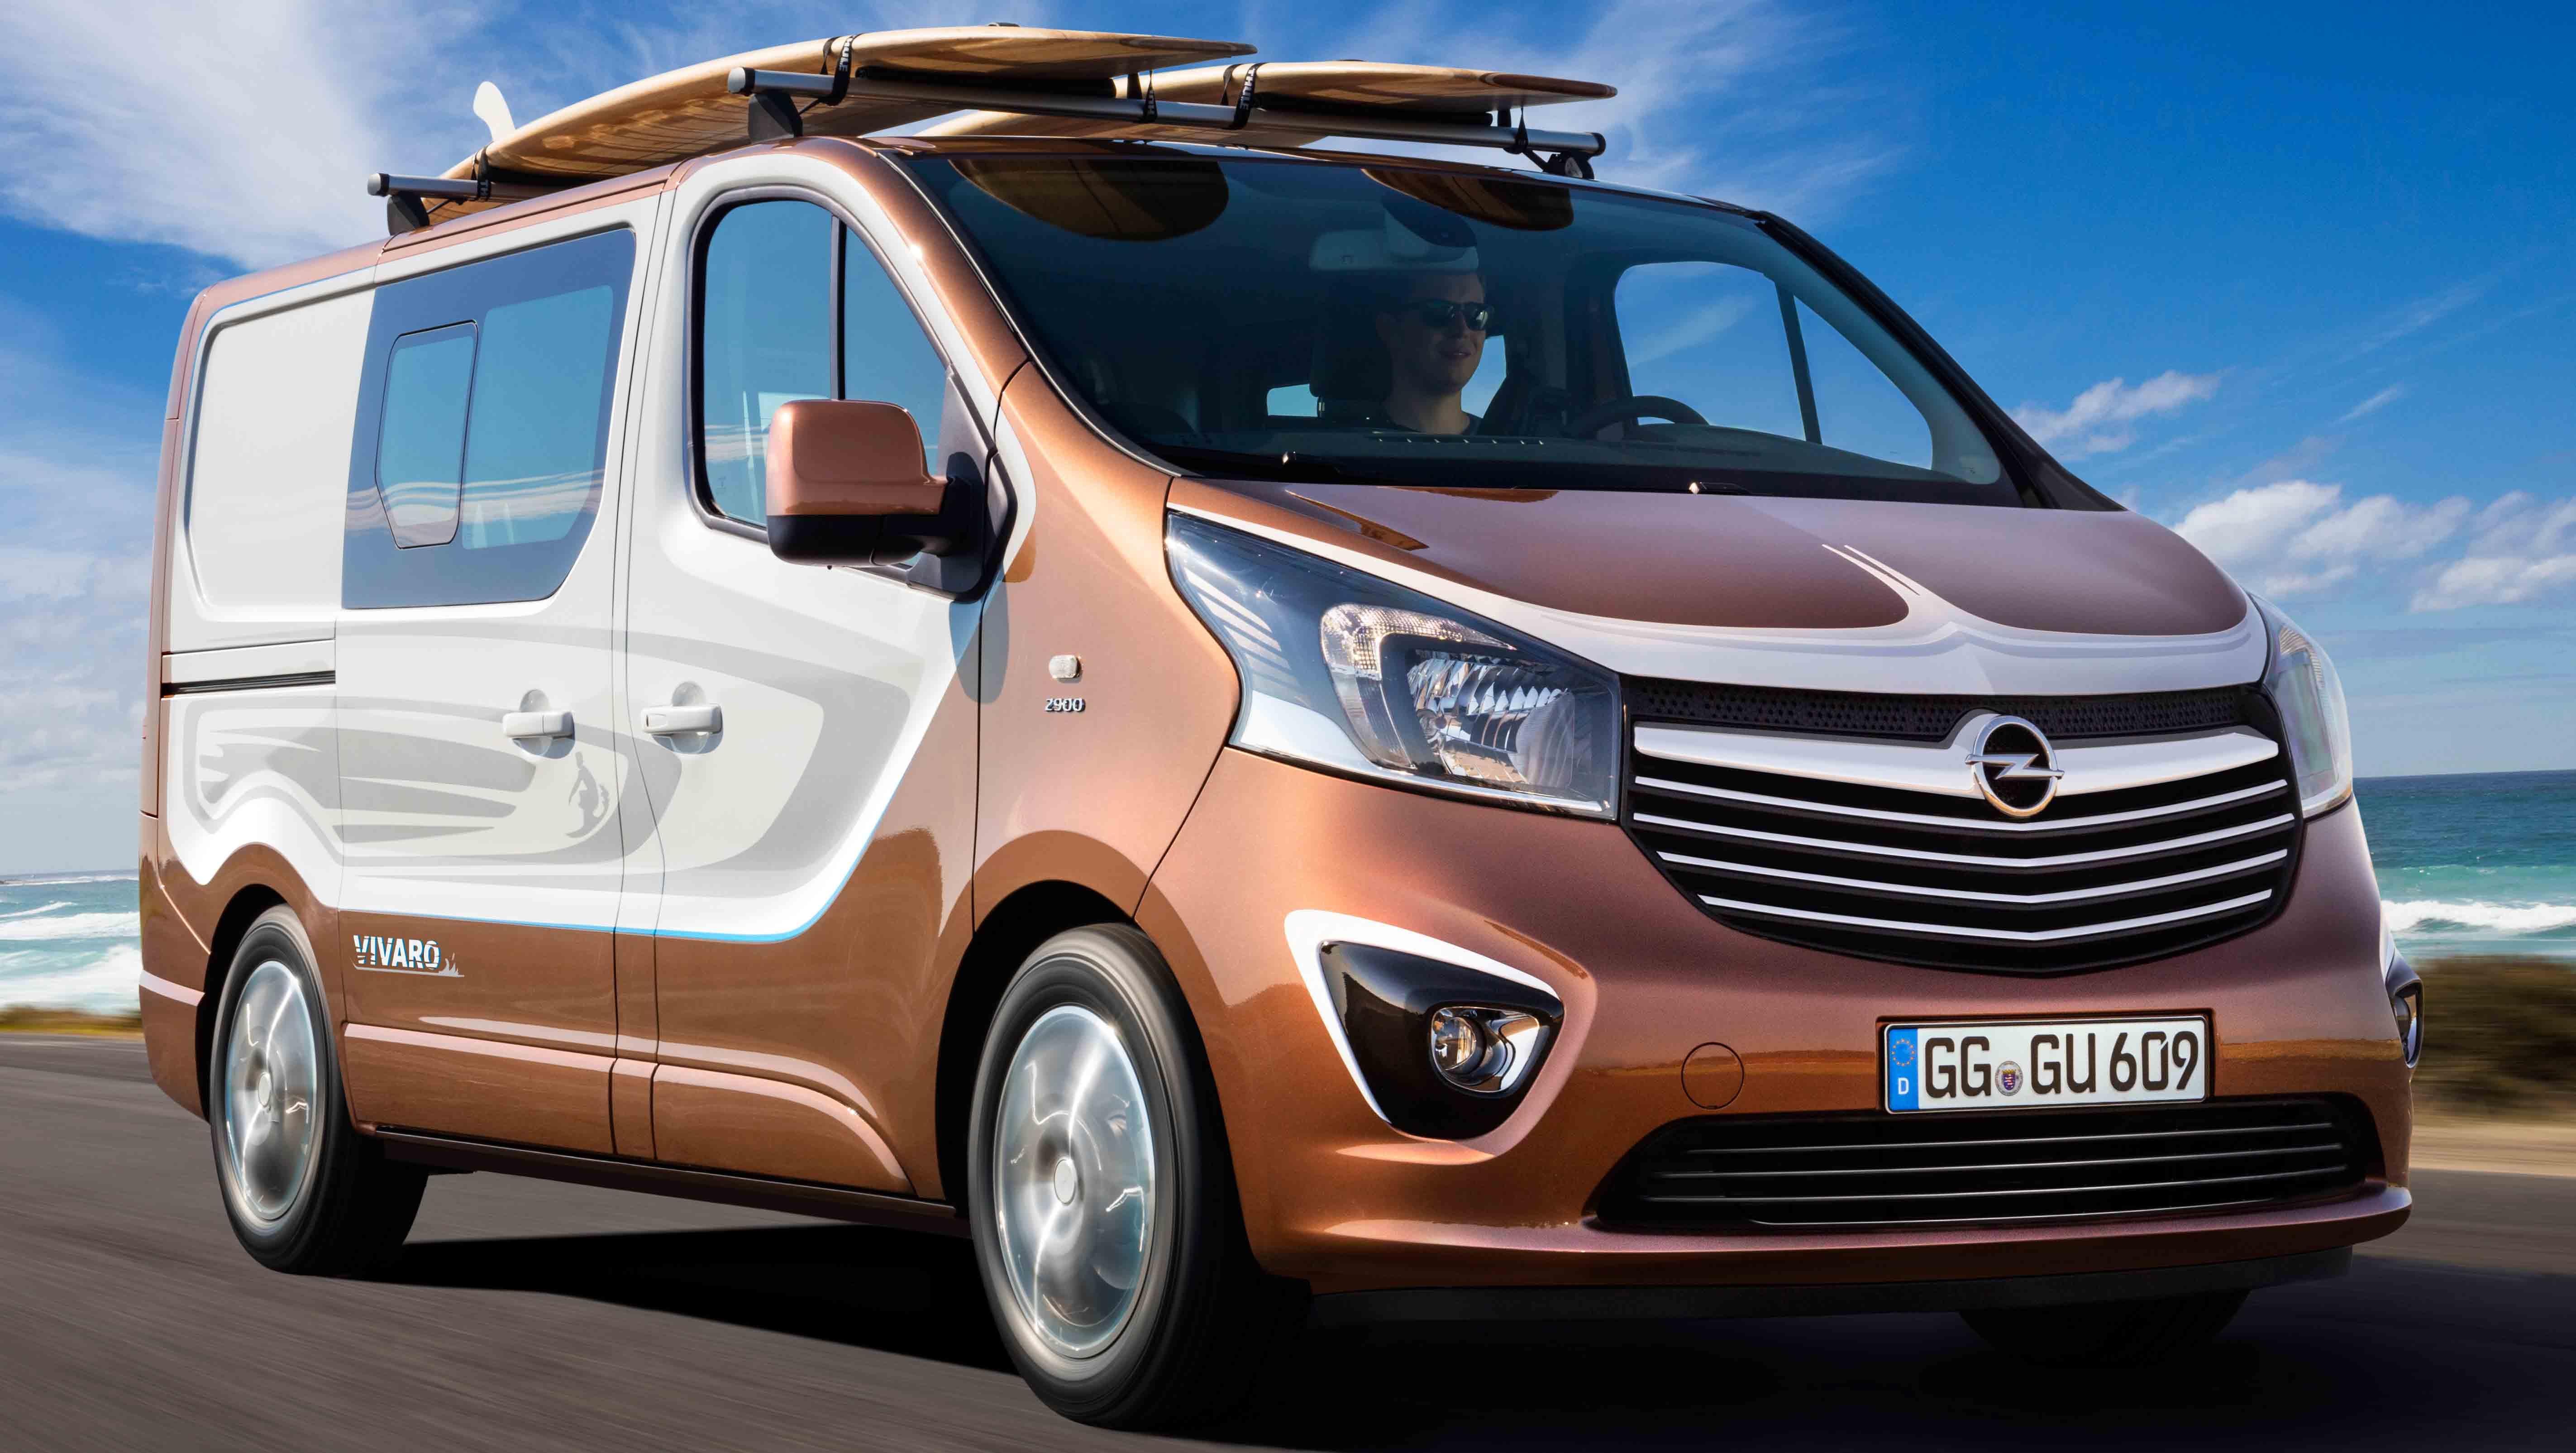 opel vivaro surf edition previews next holden sandman car news carsguide. Black Bedroom Furniture Sets. Home Design Ideas